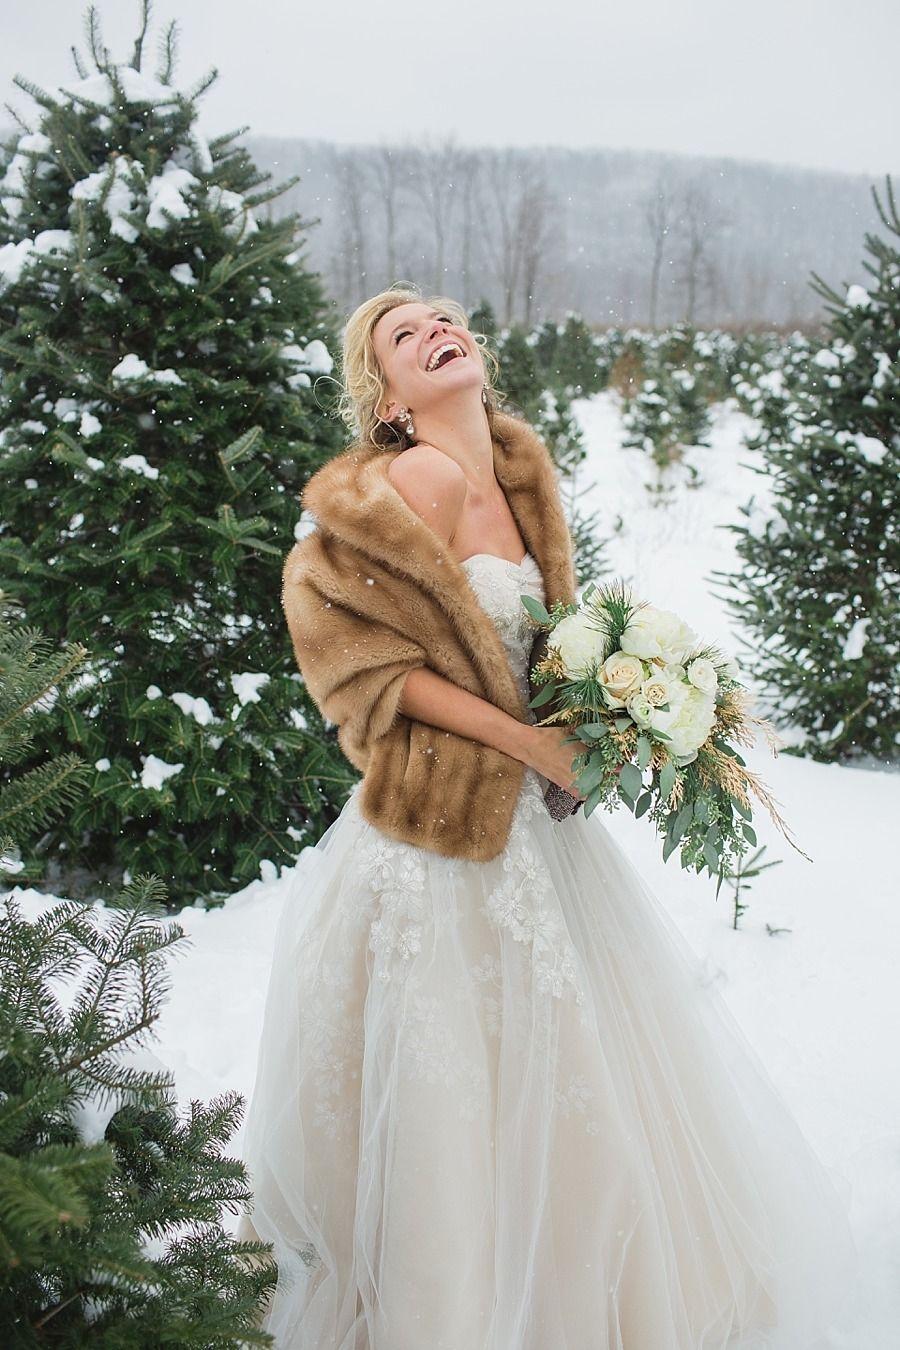 SNOW!  Photography: Lauren Fair Photography - laurenfairphotography.com